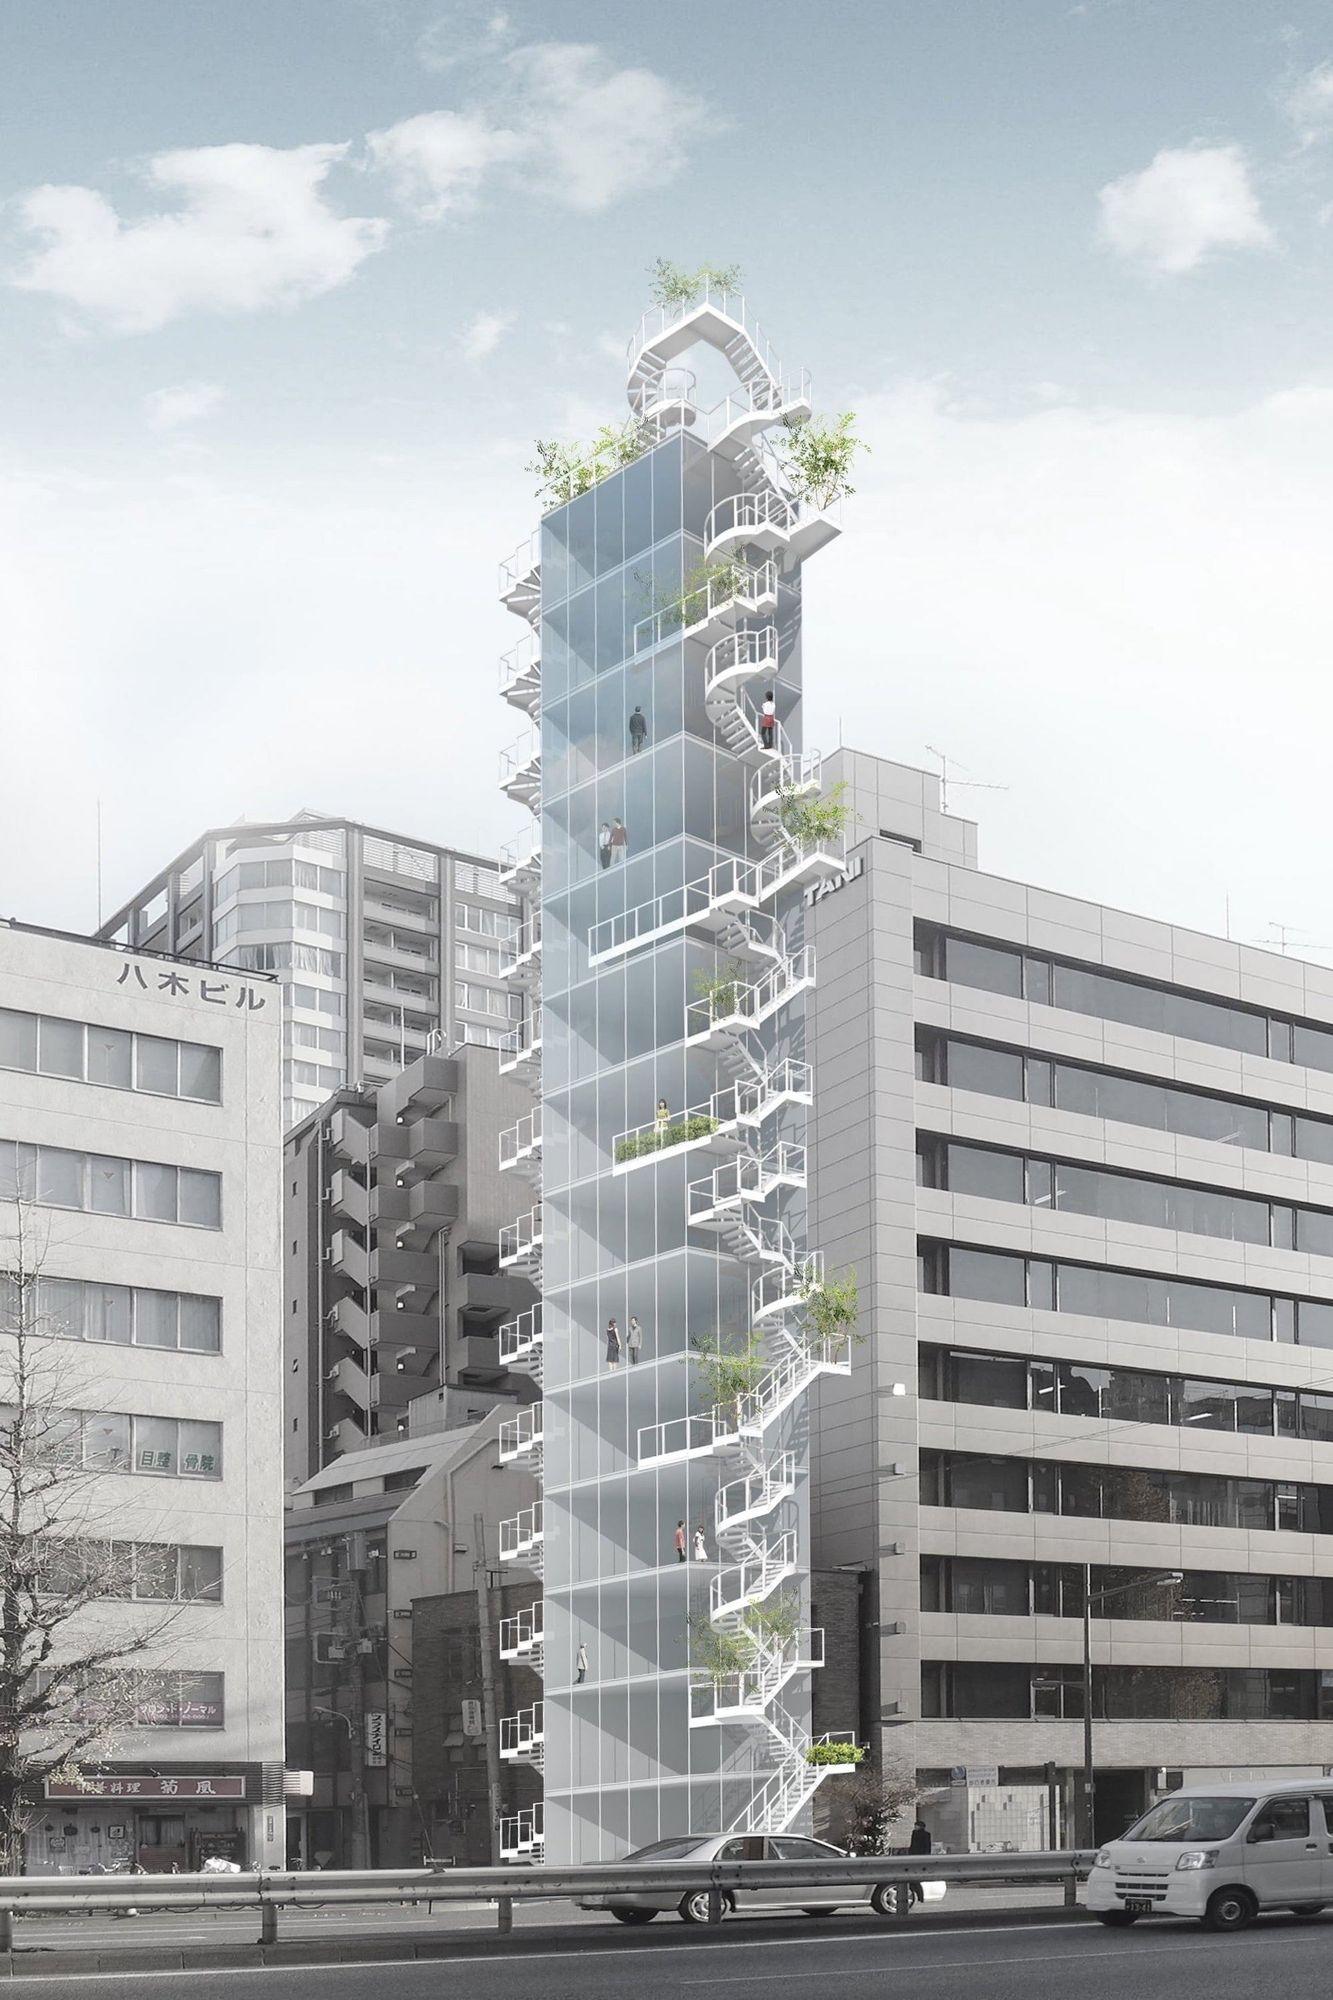 sou-fujimoto-.-Ginza-Building-.-Tokyo-afasia-3.jpg